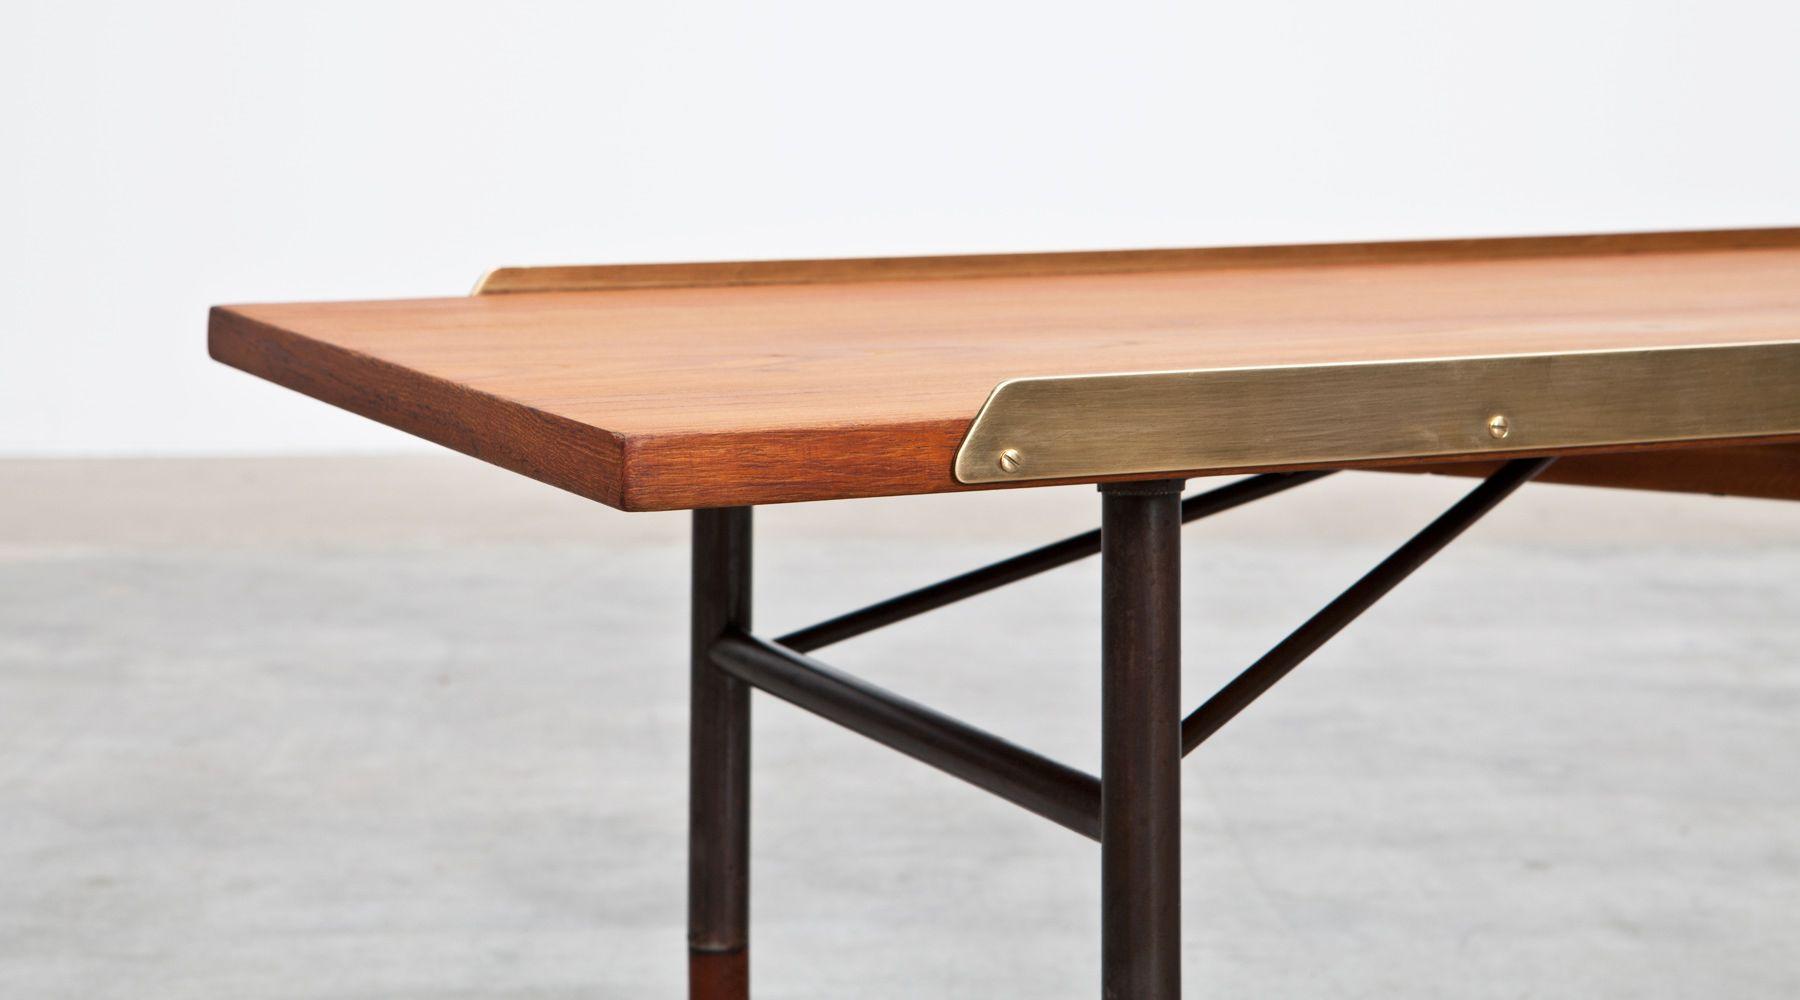 finn juhl bovirke the good old dayz. Black Bedroom Furniture Sets. Home Design Ideas